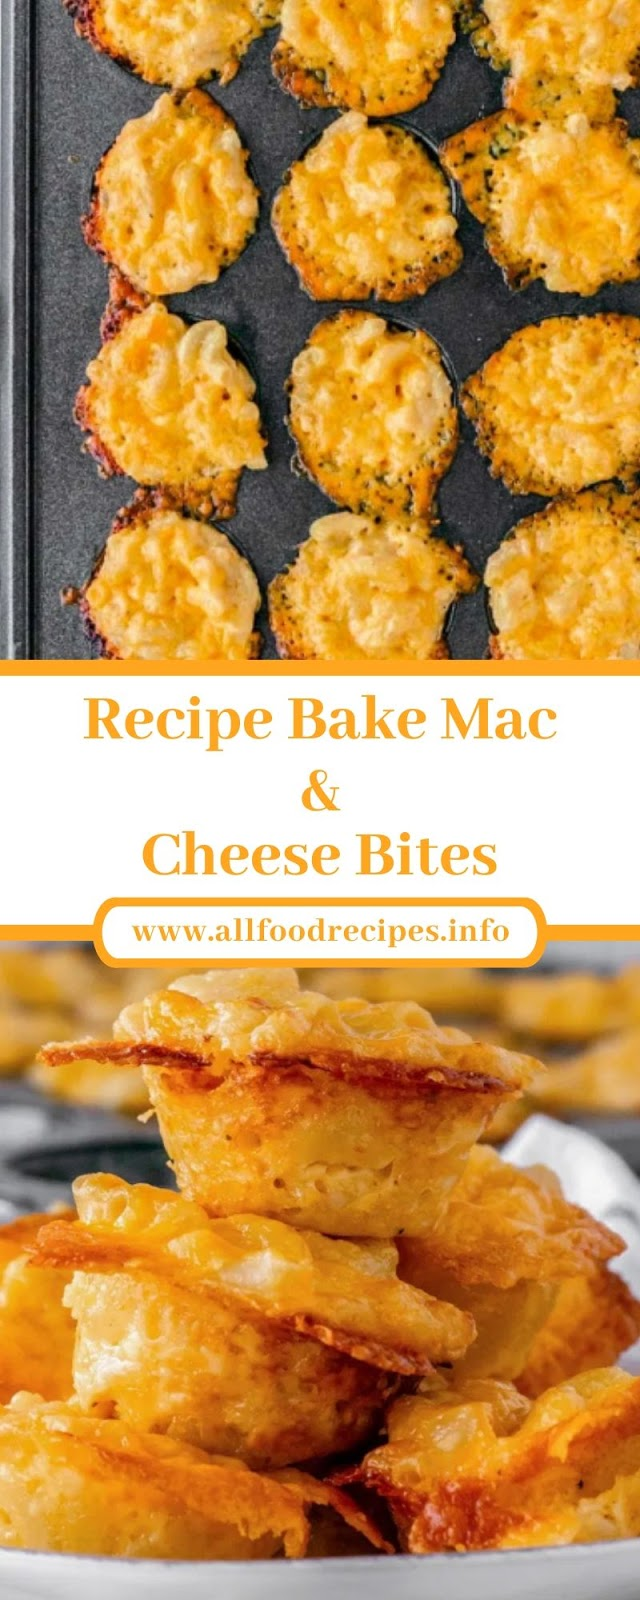 Recipe Bake Mac & Cheese Bites